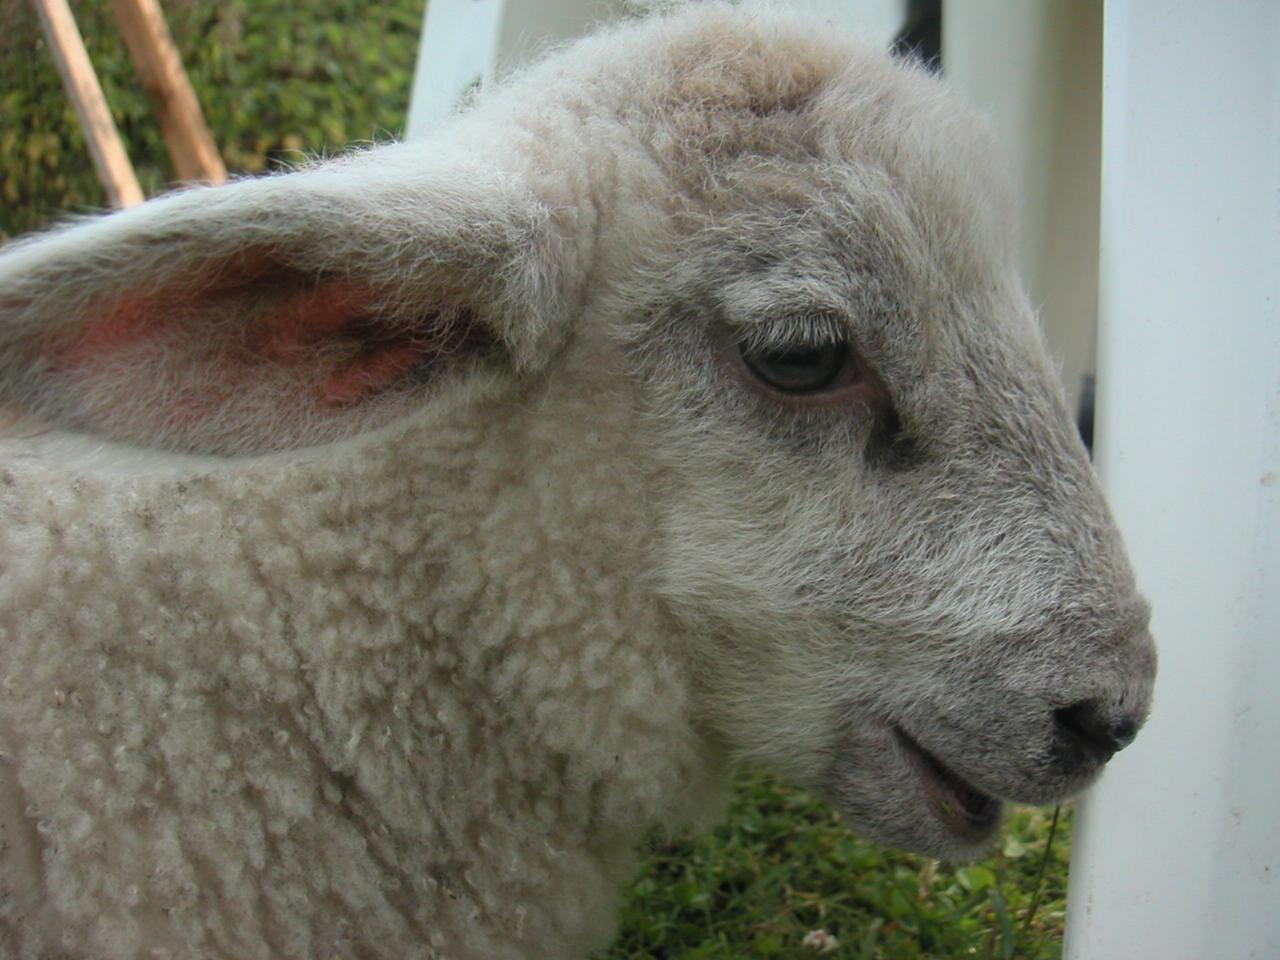 a little baby lamb on a farm sanctuary.